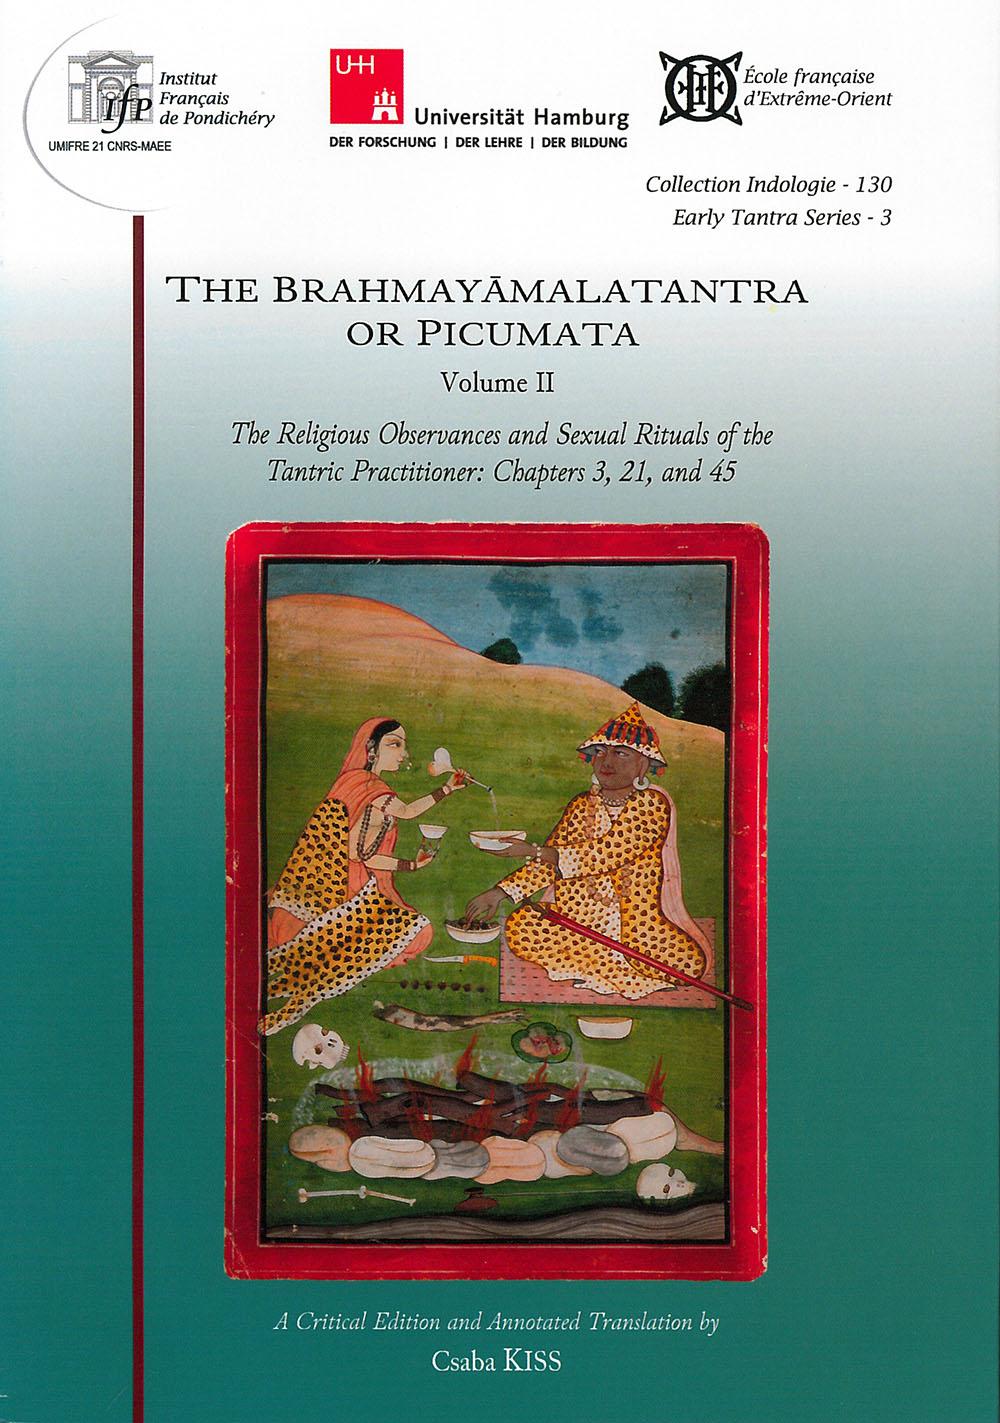 The Brahmayāmalatantra or Picumata